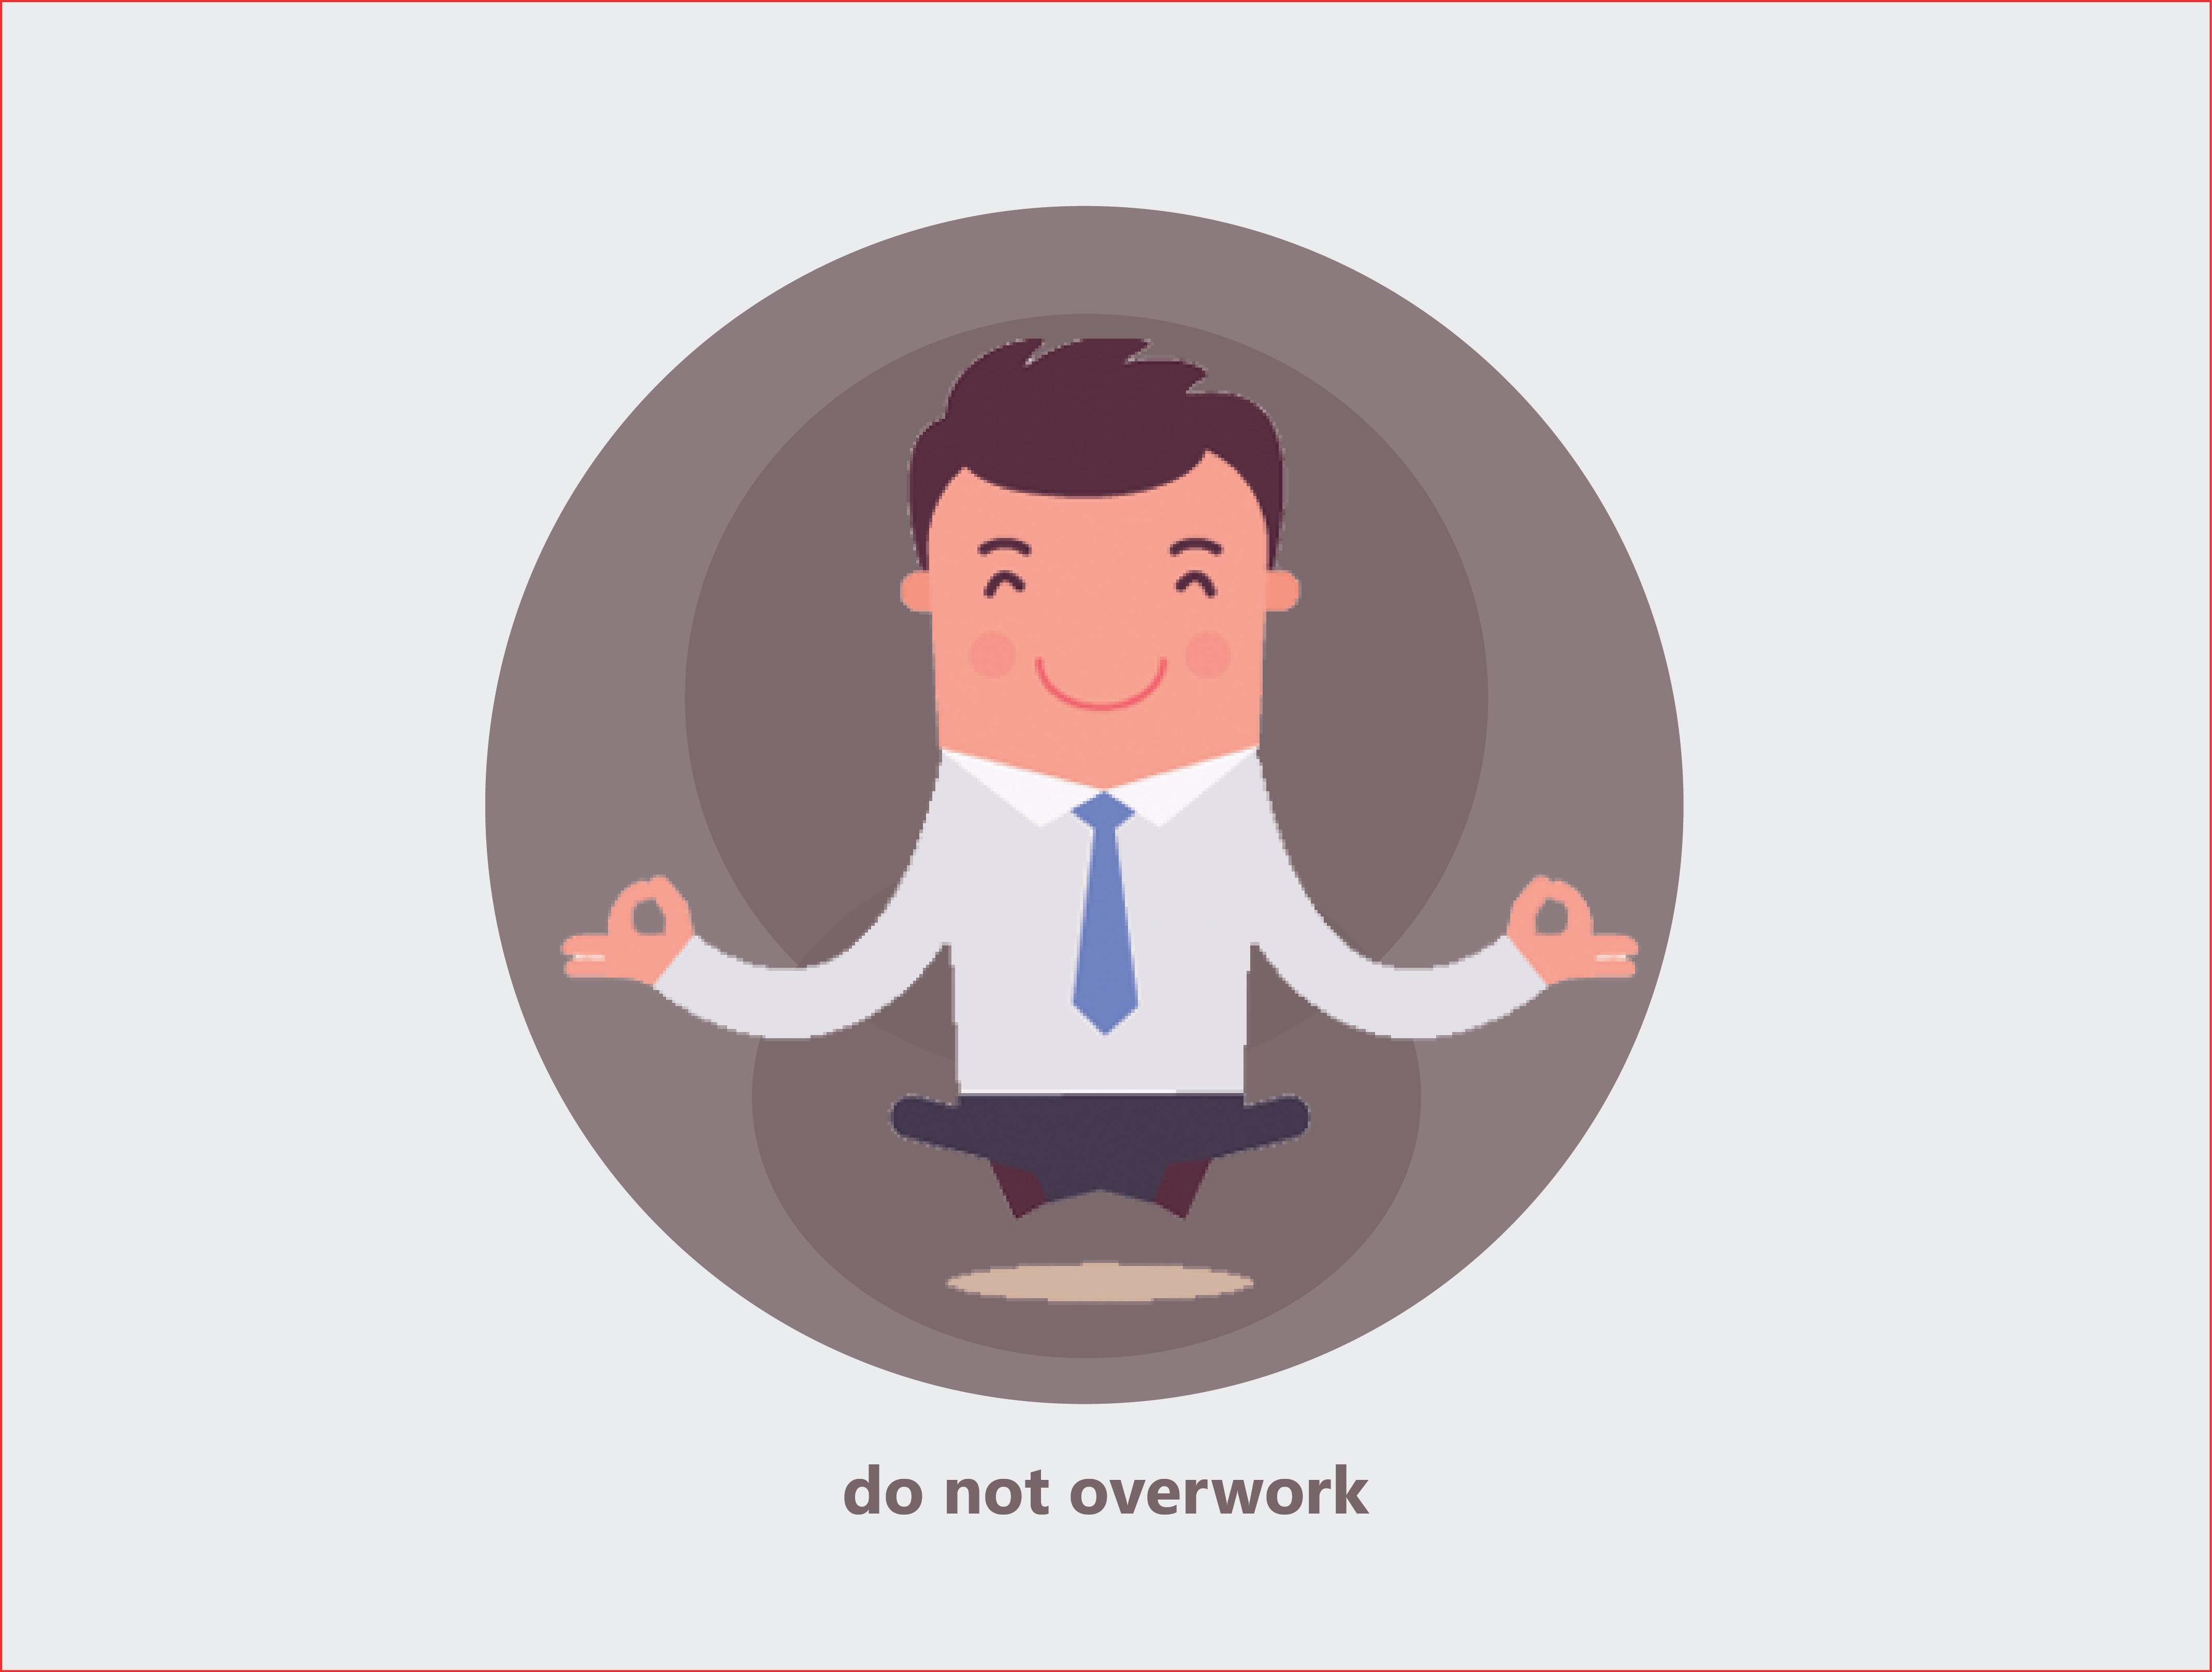 Do not overwork